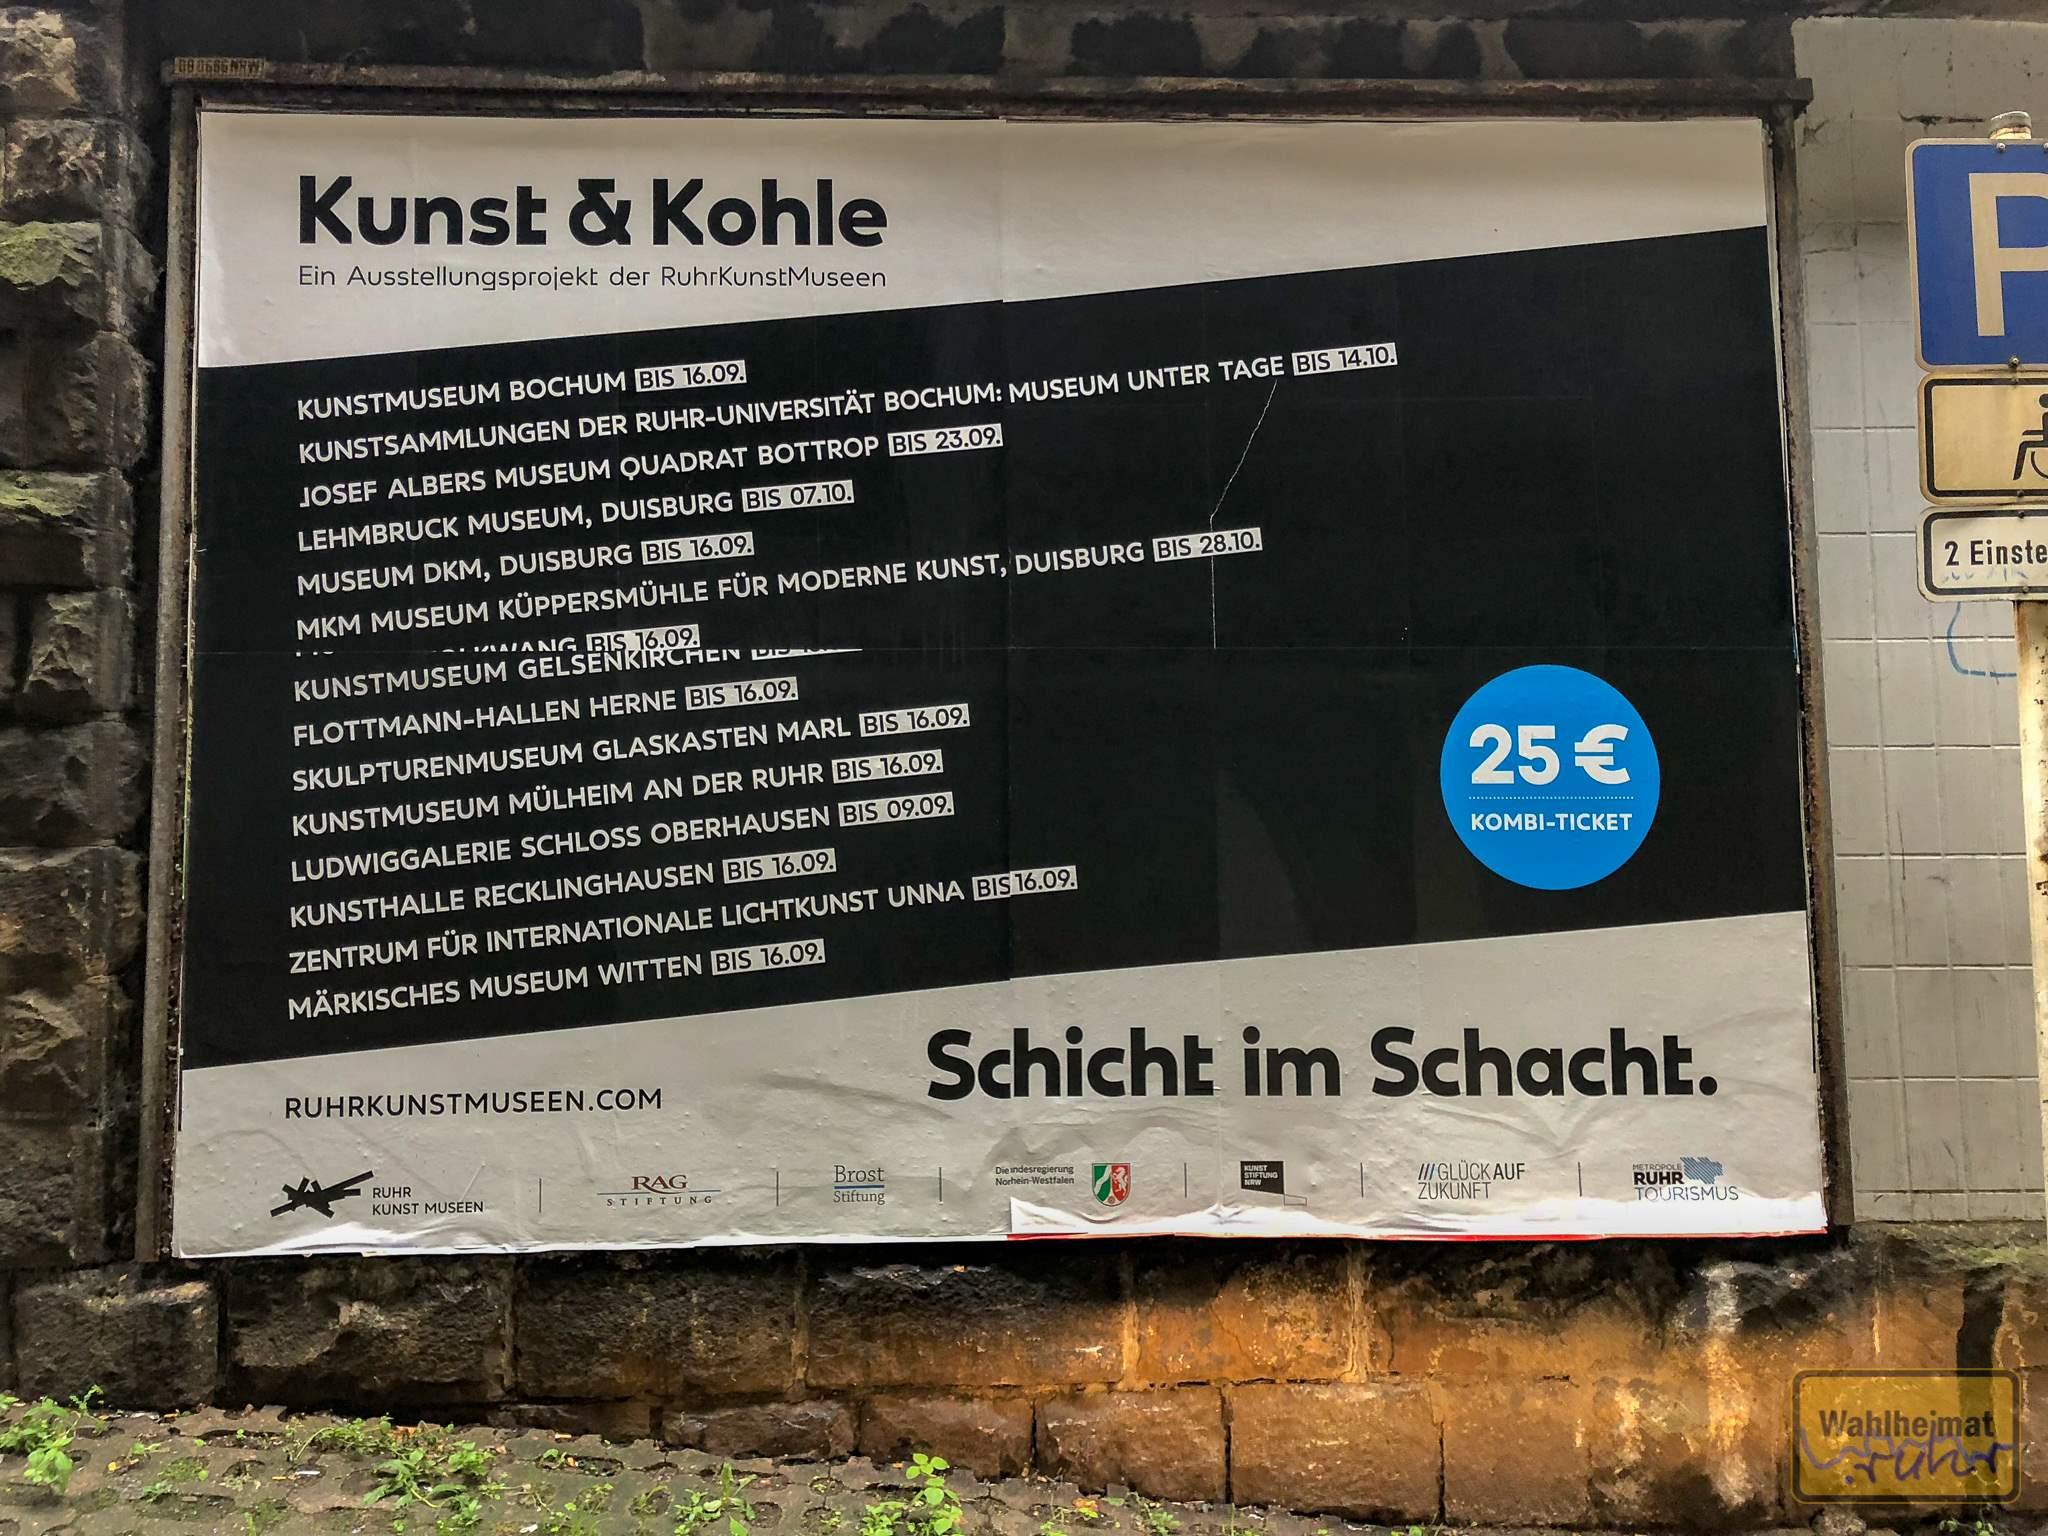 "Ausstellungsplakat ""Kunst & Kohle"" am Mülheimer Hauptbahnhof."